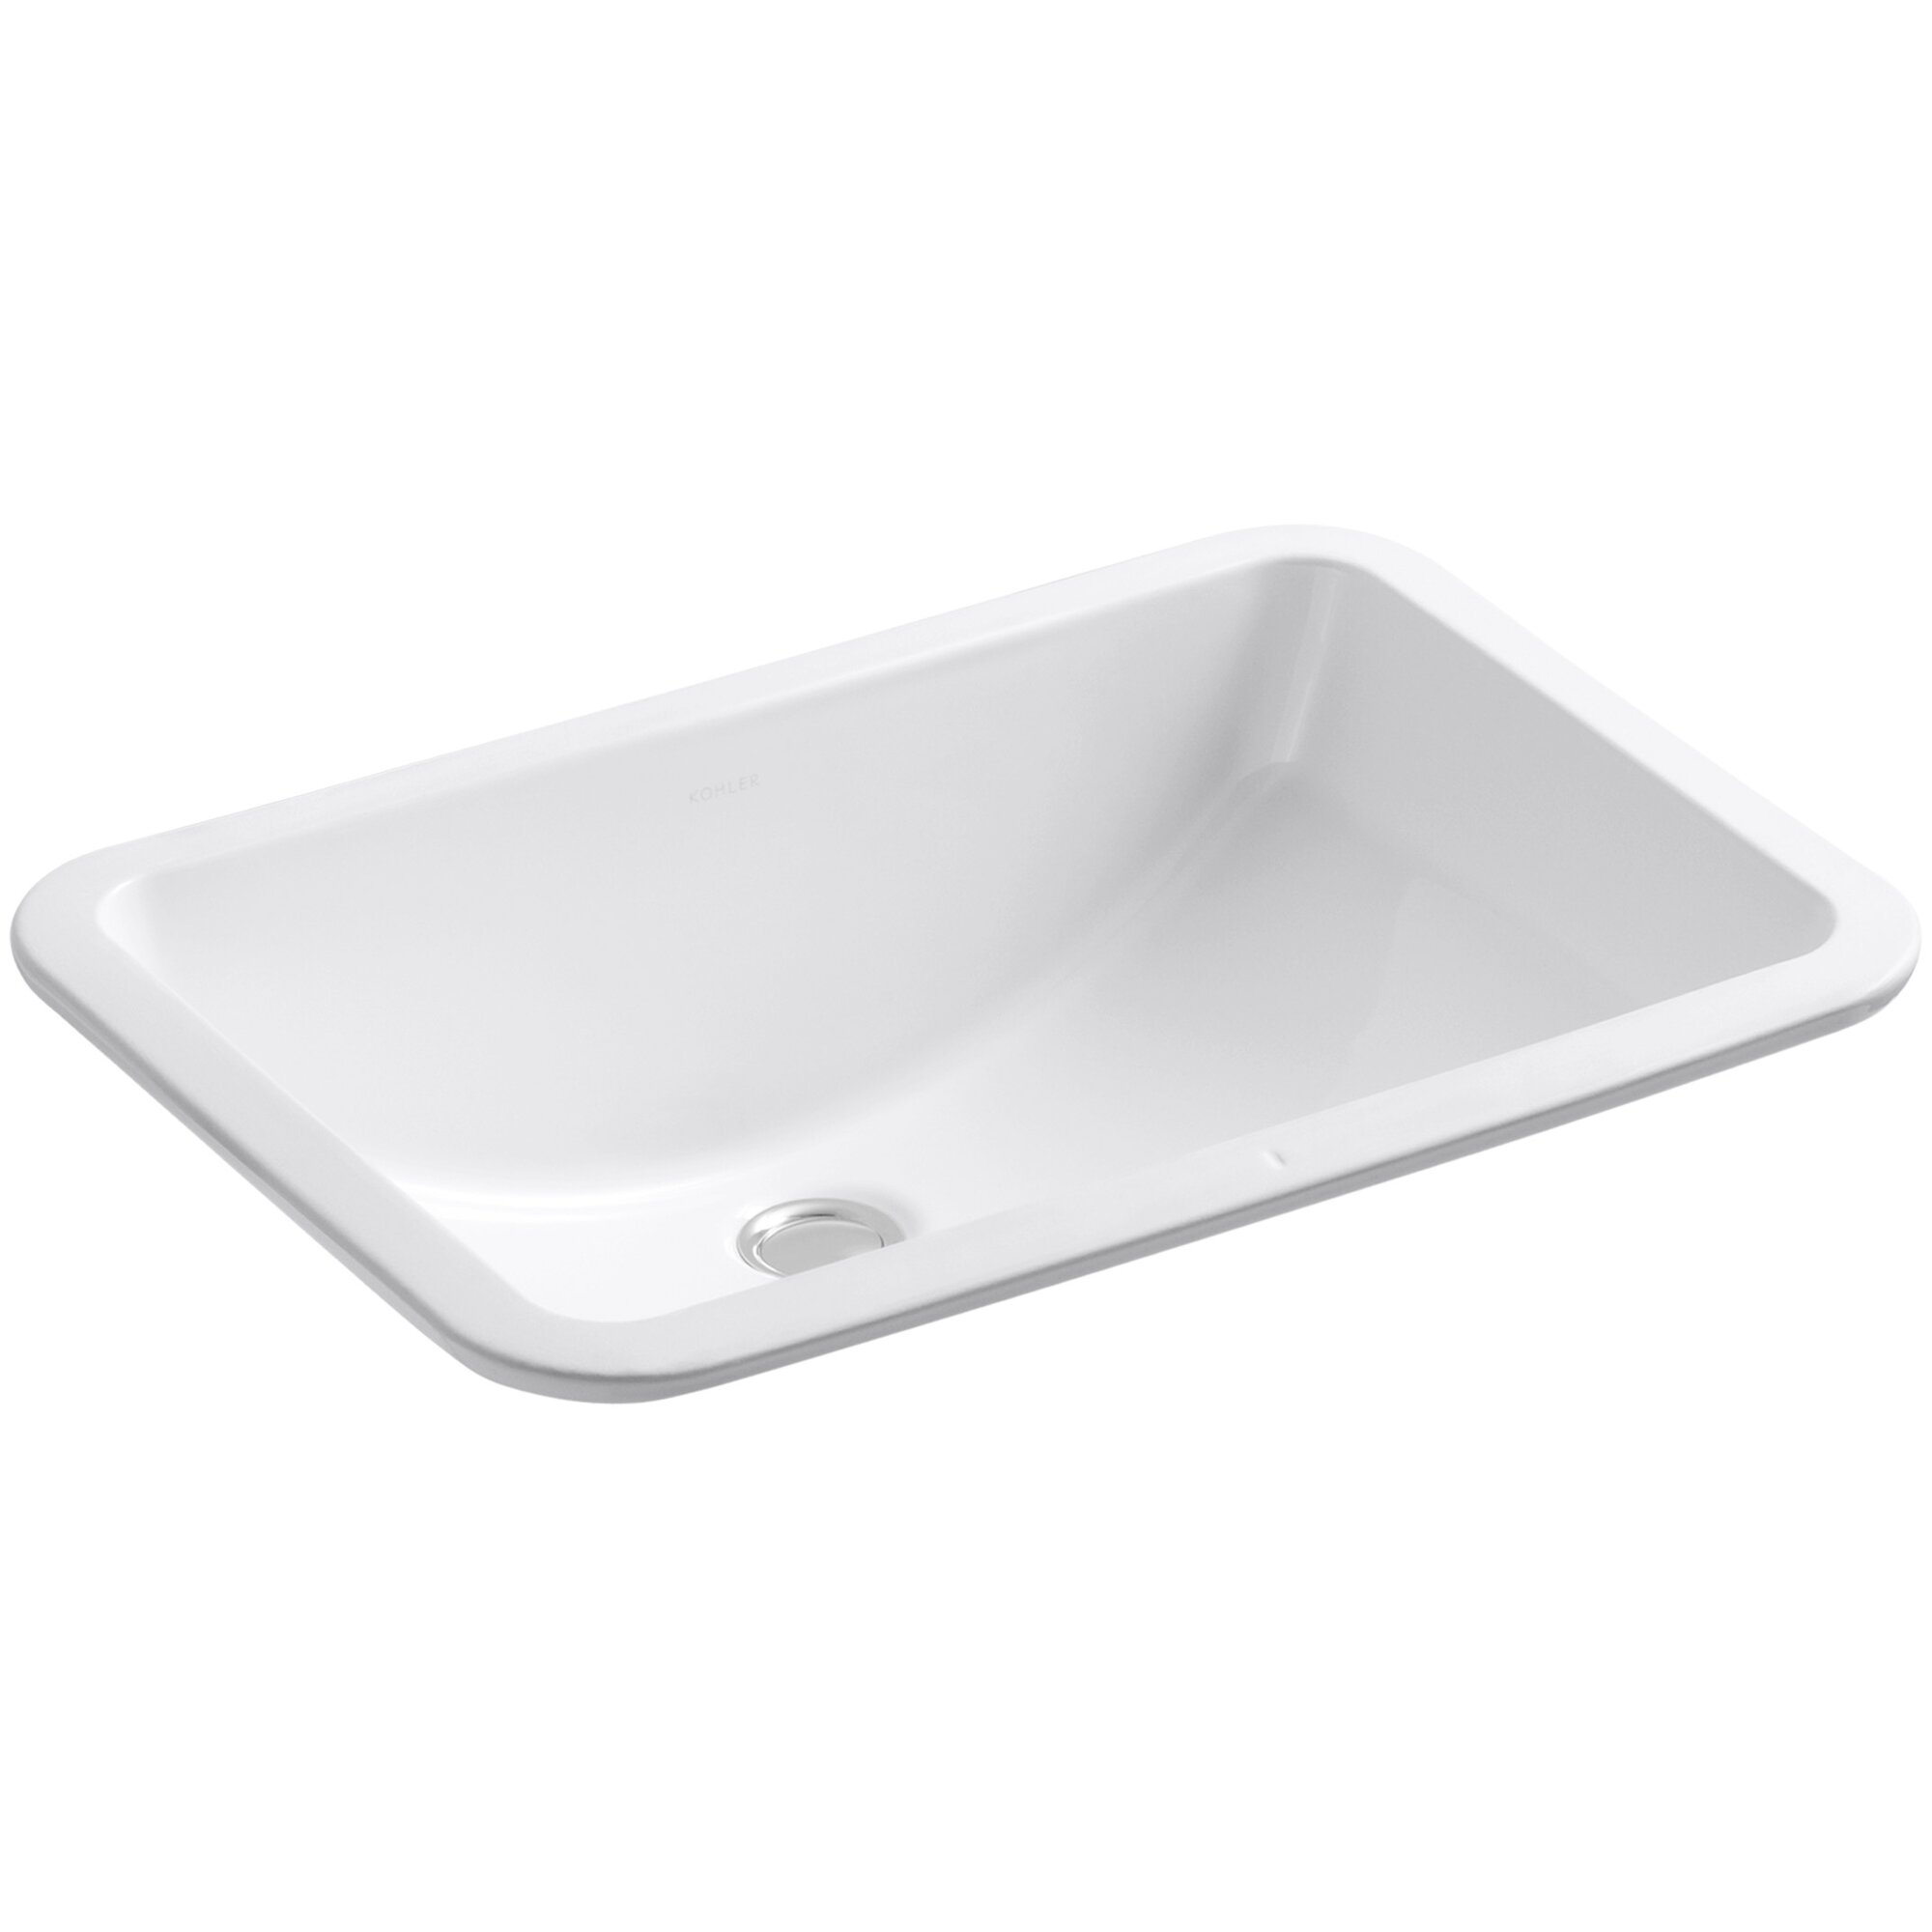 Bathroom sink dimensions mm - Ladena Rectangular Undermount Bathroom Sink